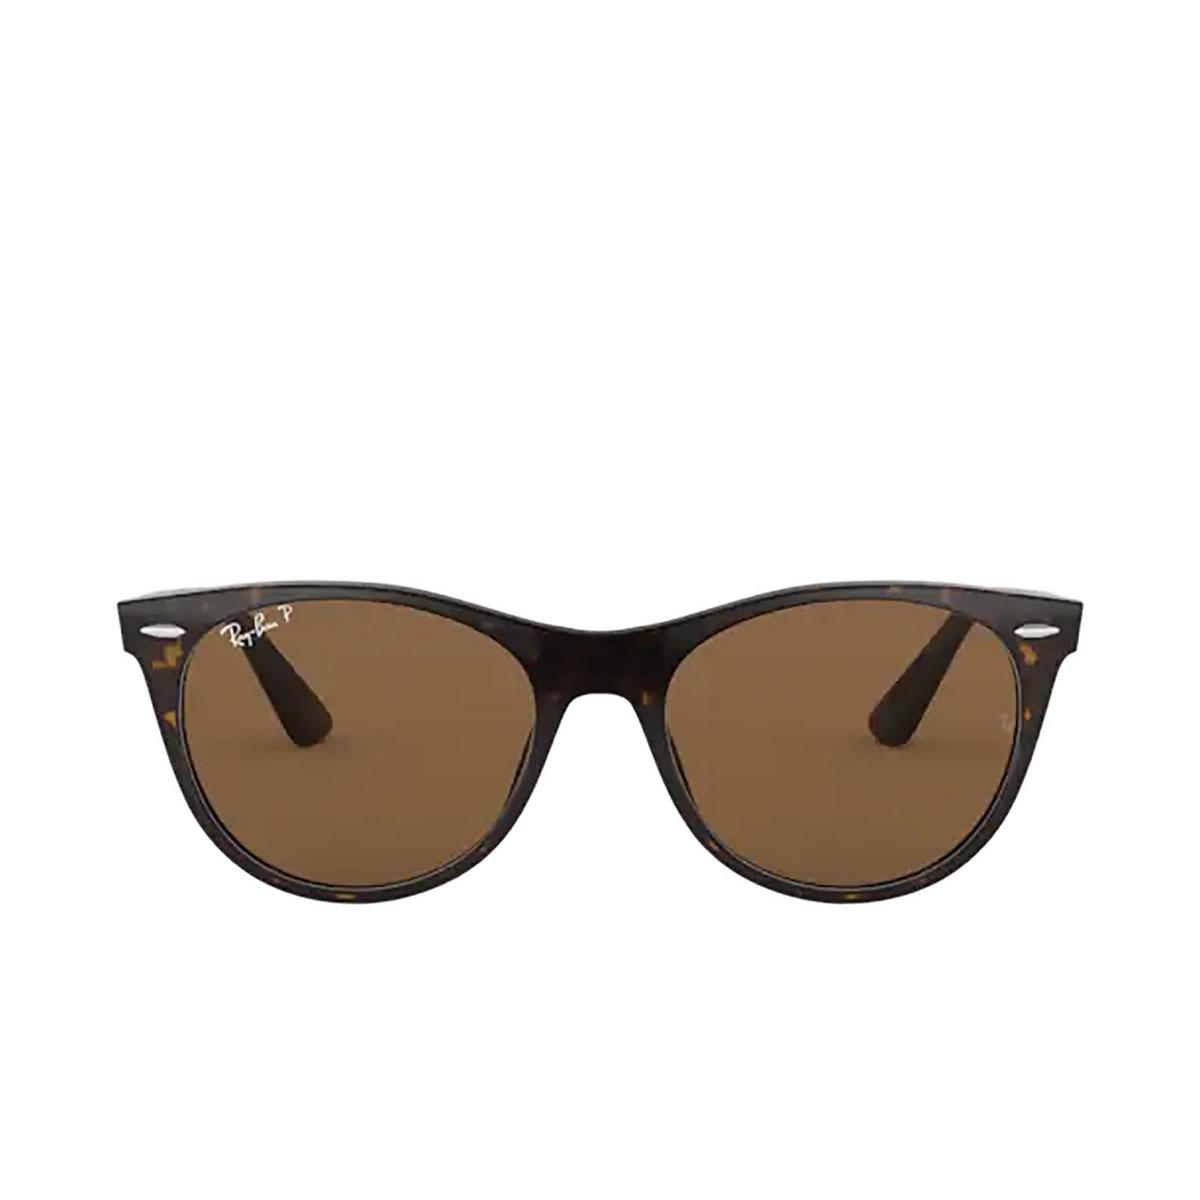 Ray-Ban® Round Sunglasses: Wayfarer Ii RB2185 color Tortoise 902/57.